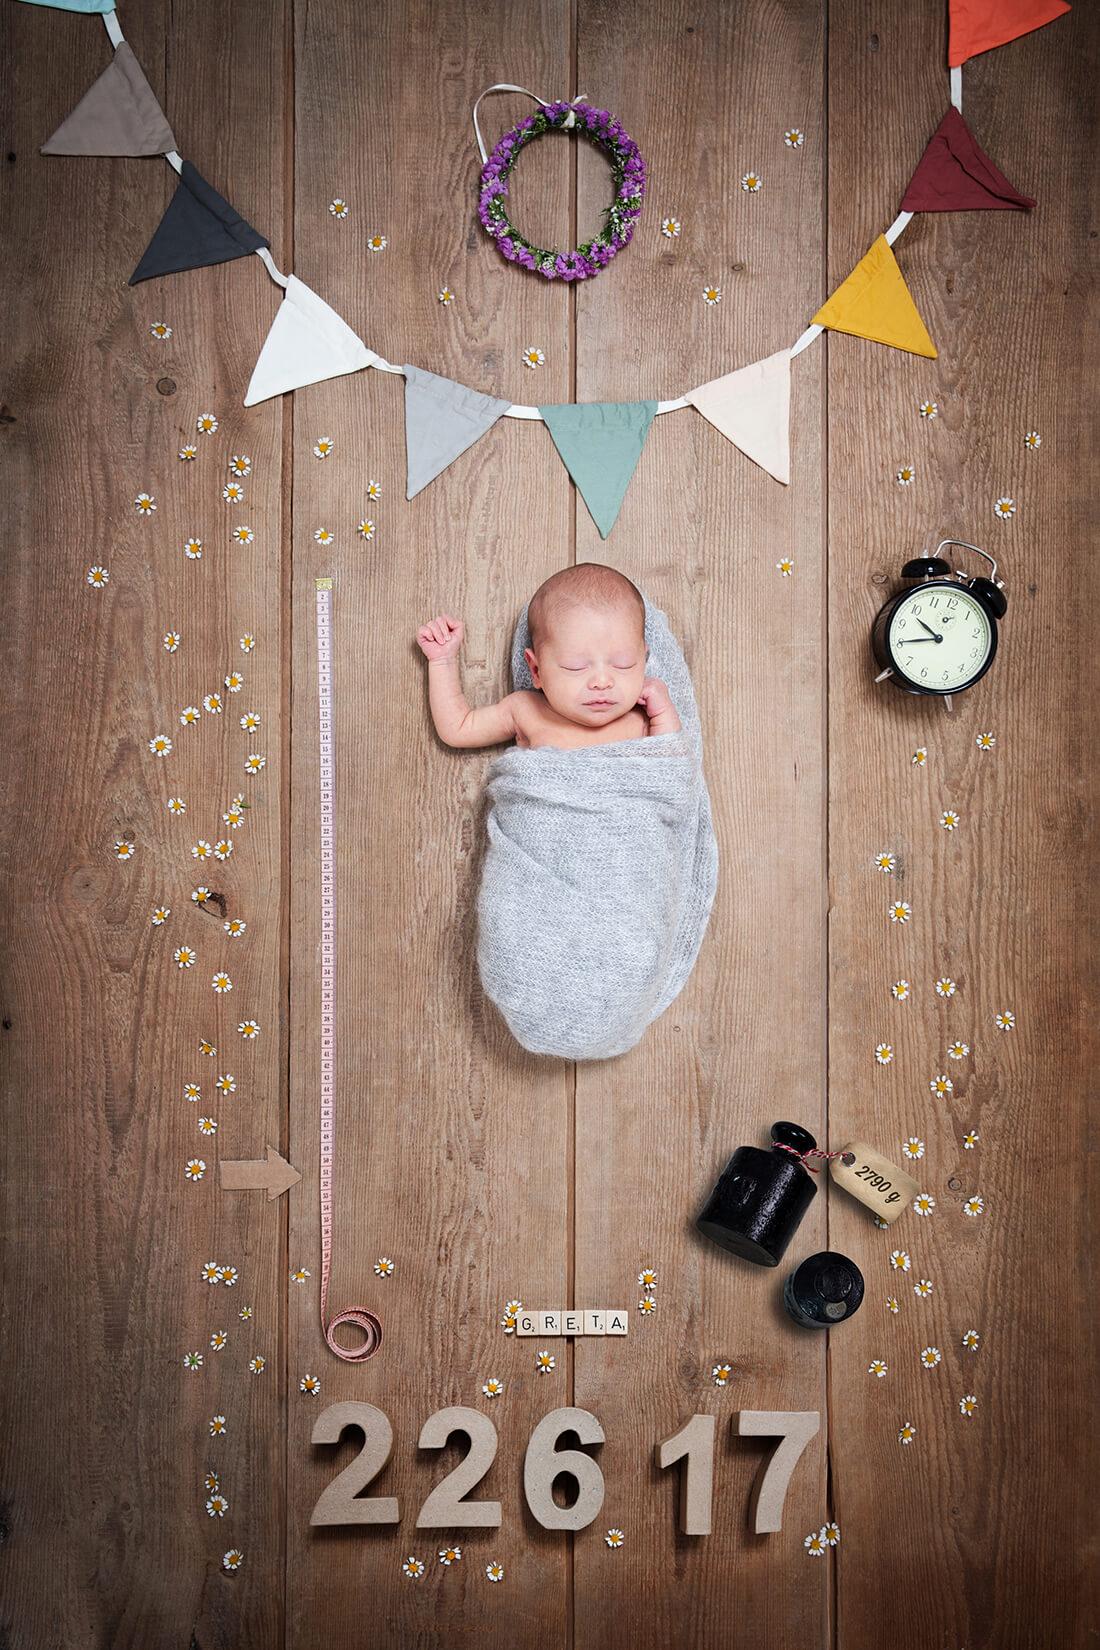 Babyfotografie_Neugeborenencollage © Little Monkey Fotografie, Berlin 2018